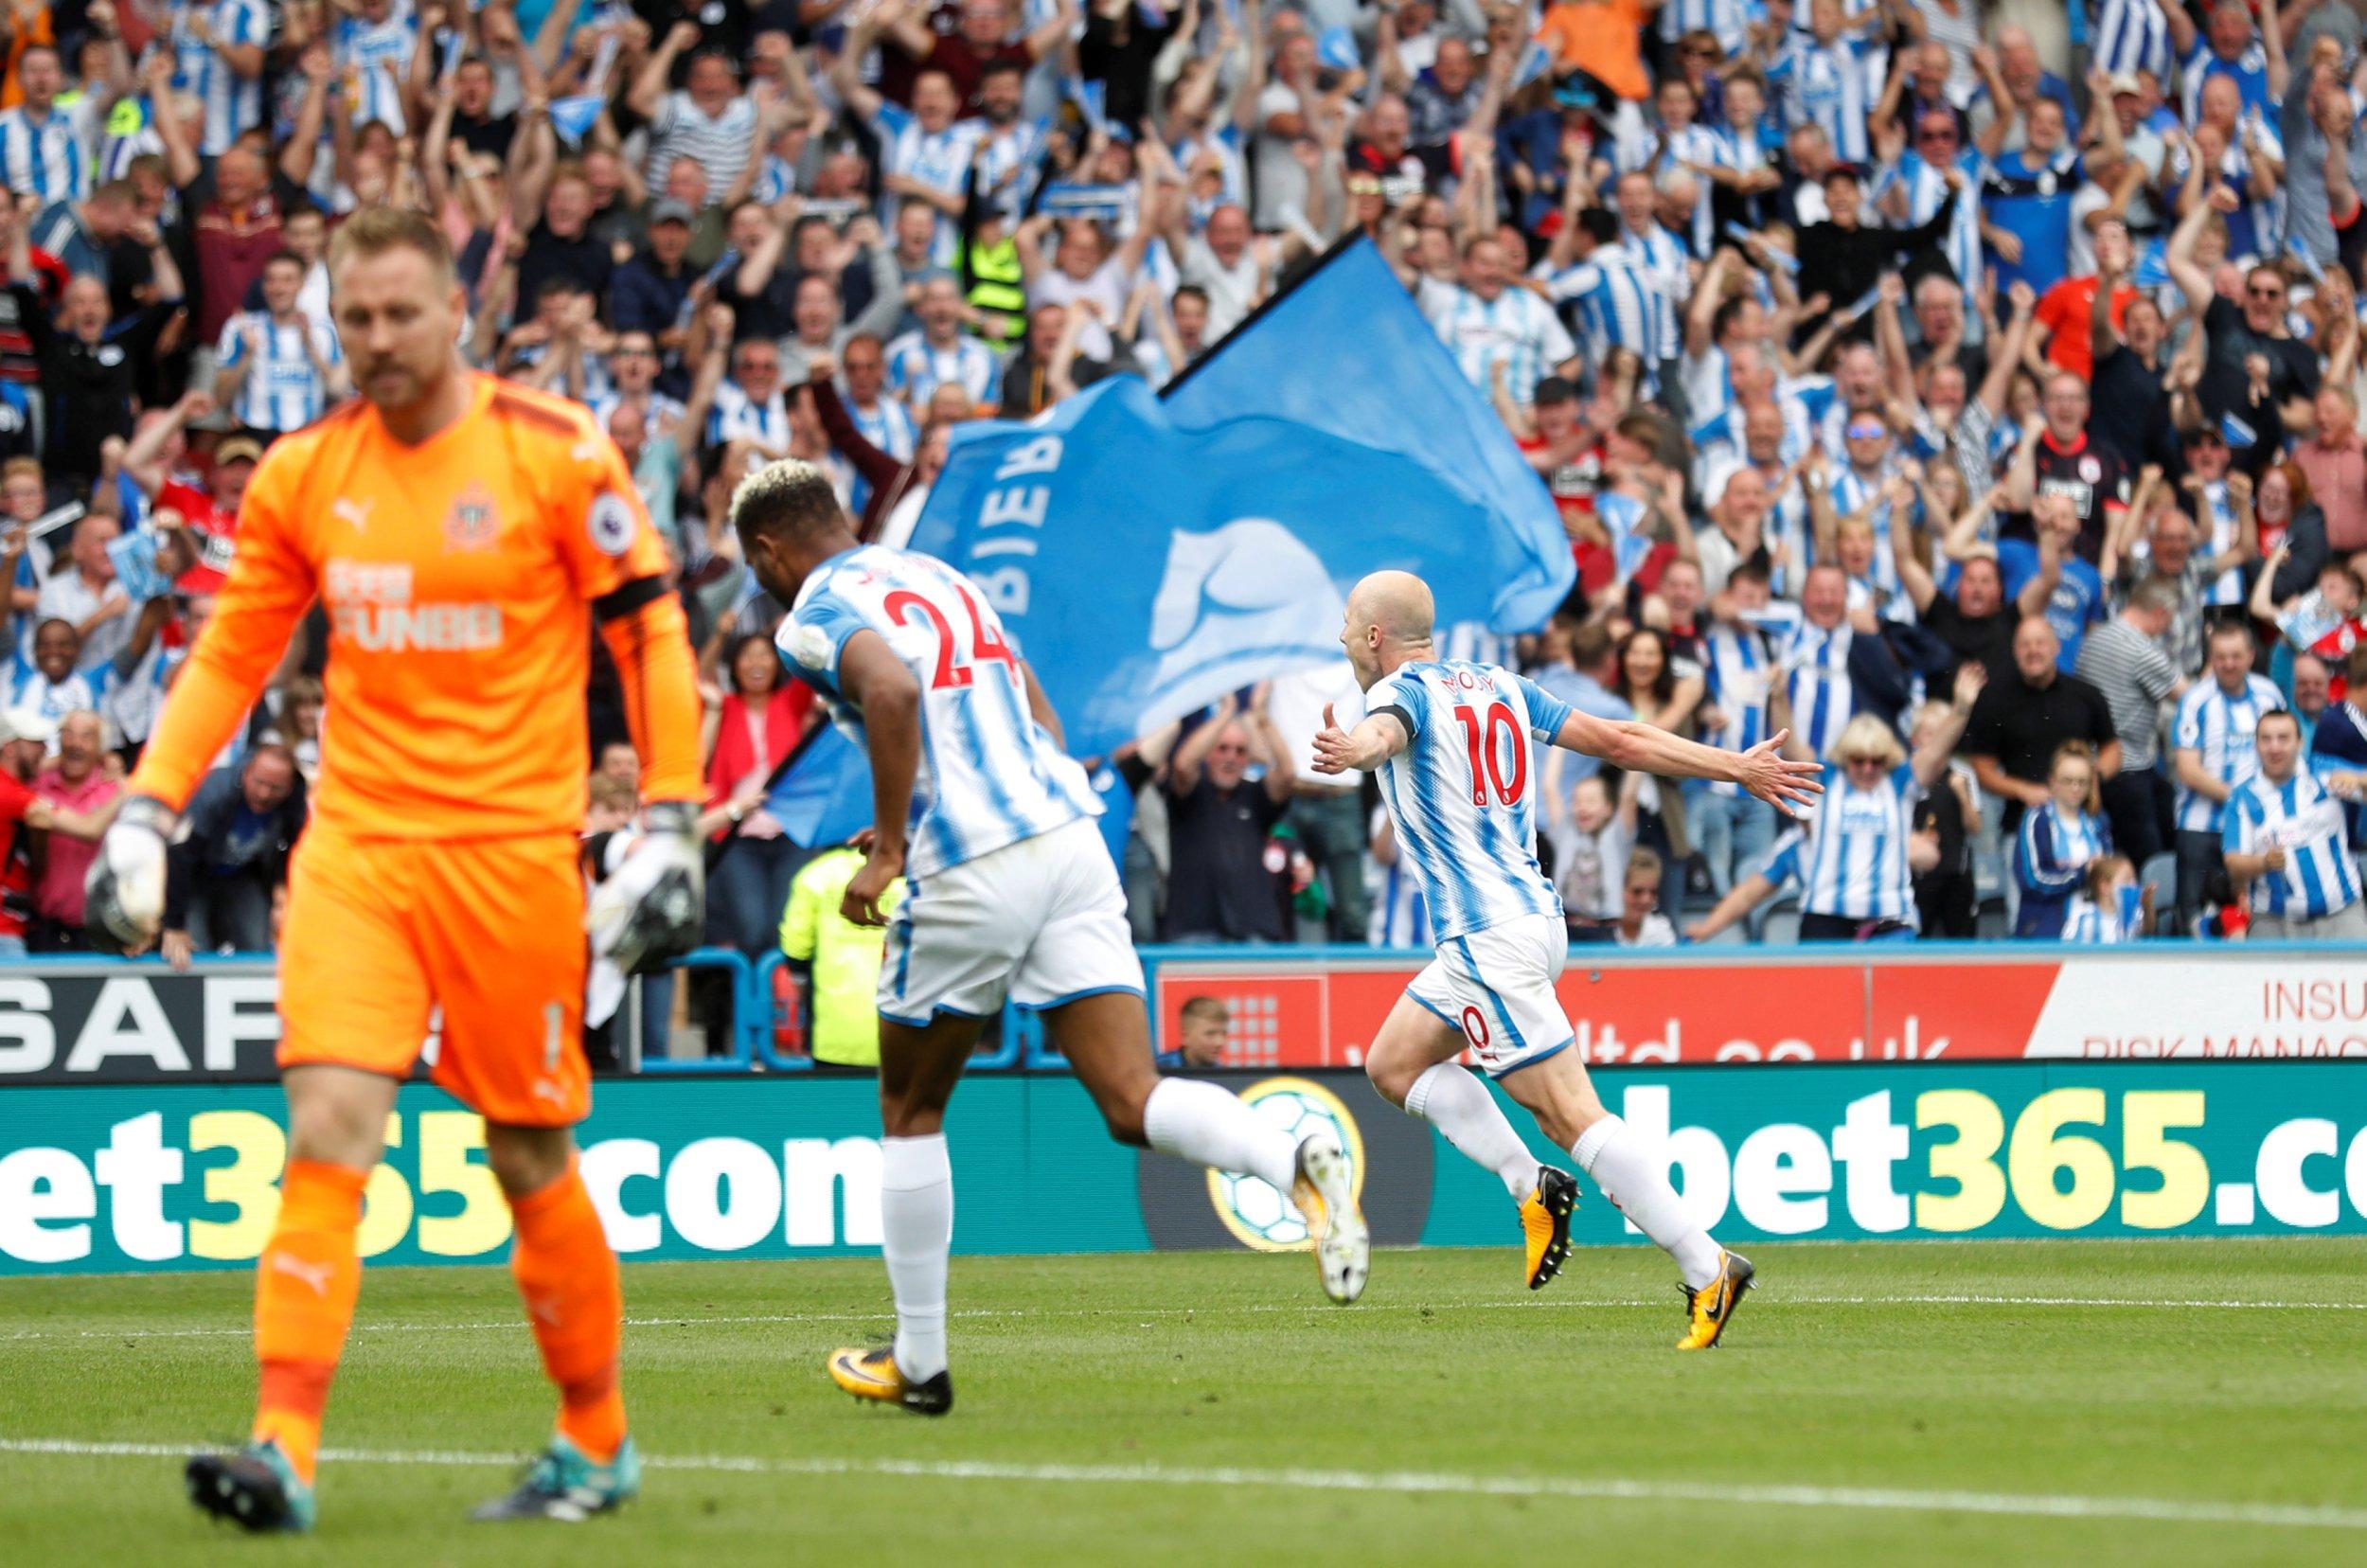 Huddersfield make history as their dream Premier League start continues